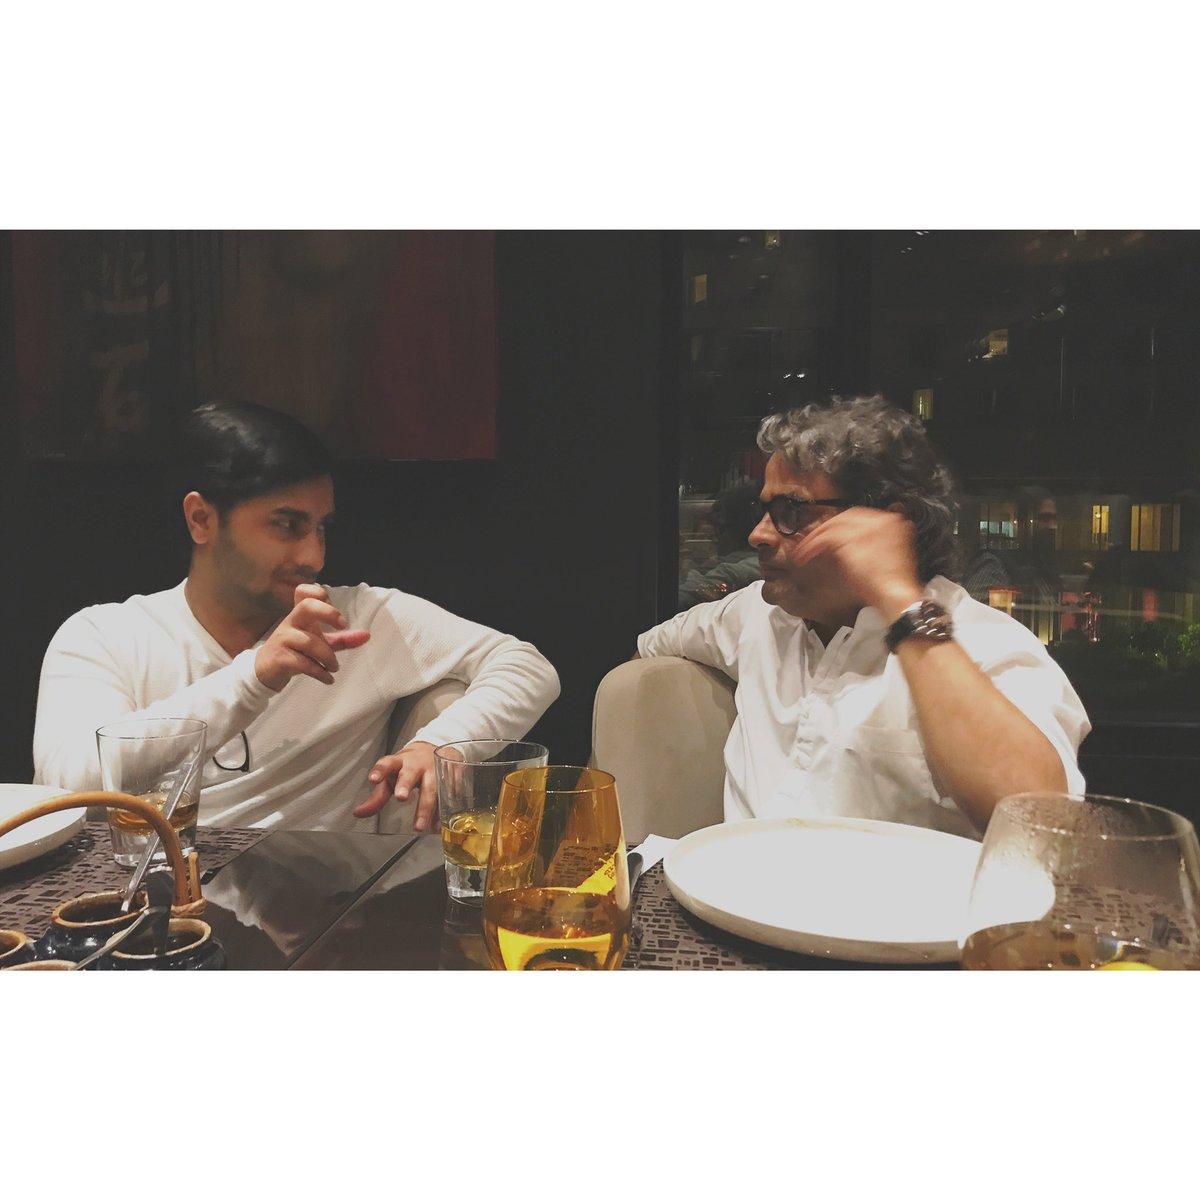 We were probably talking about a film #throwback @VishalBhardwaj  📸 @rekha_bhardwaj https://t.co/GWSryQDxuS